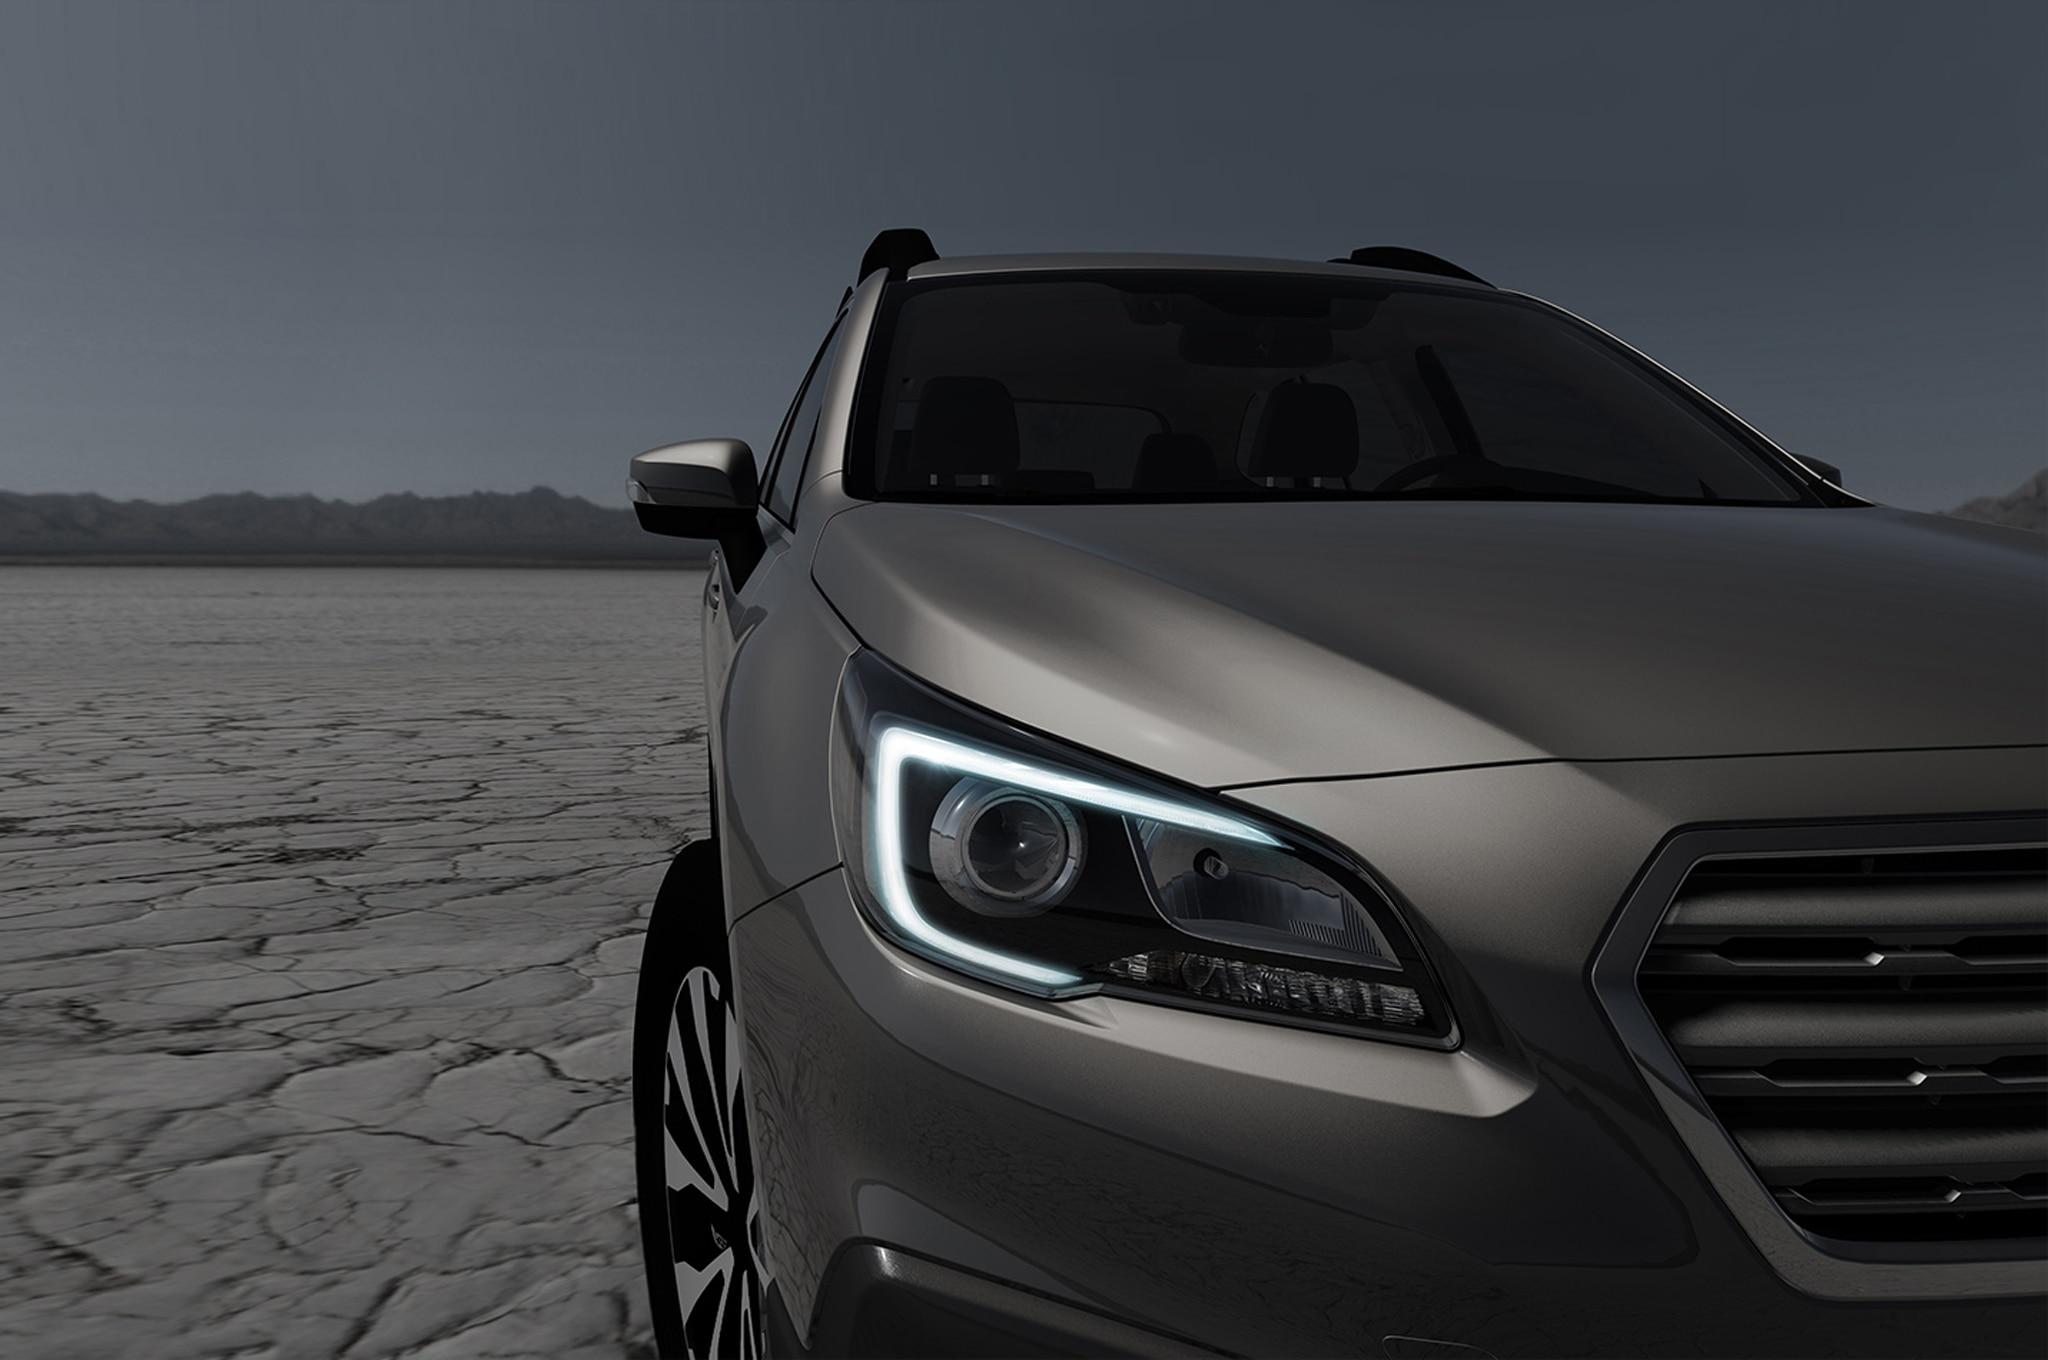 2015 Subaru Outback New York Teaser